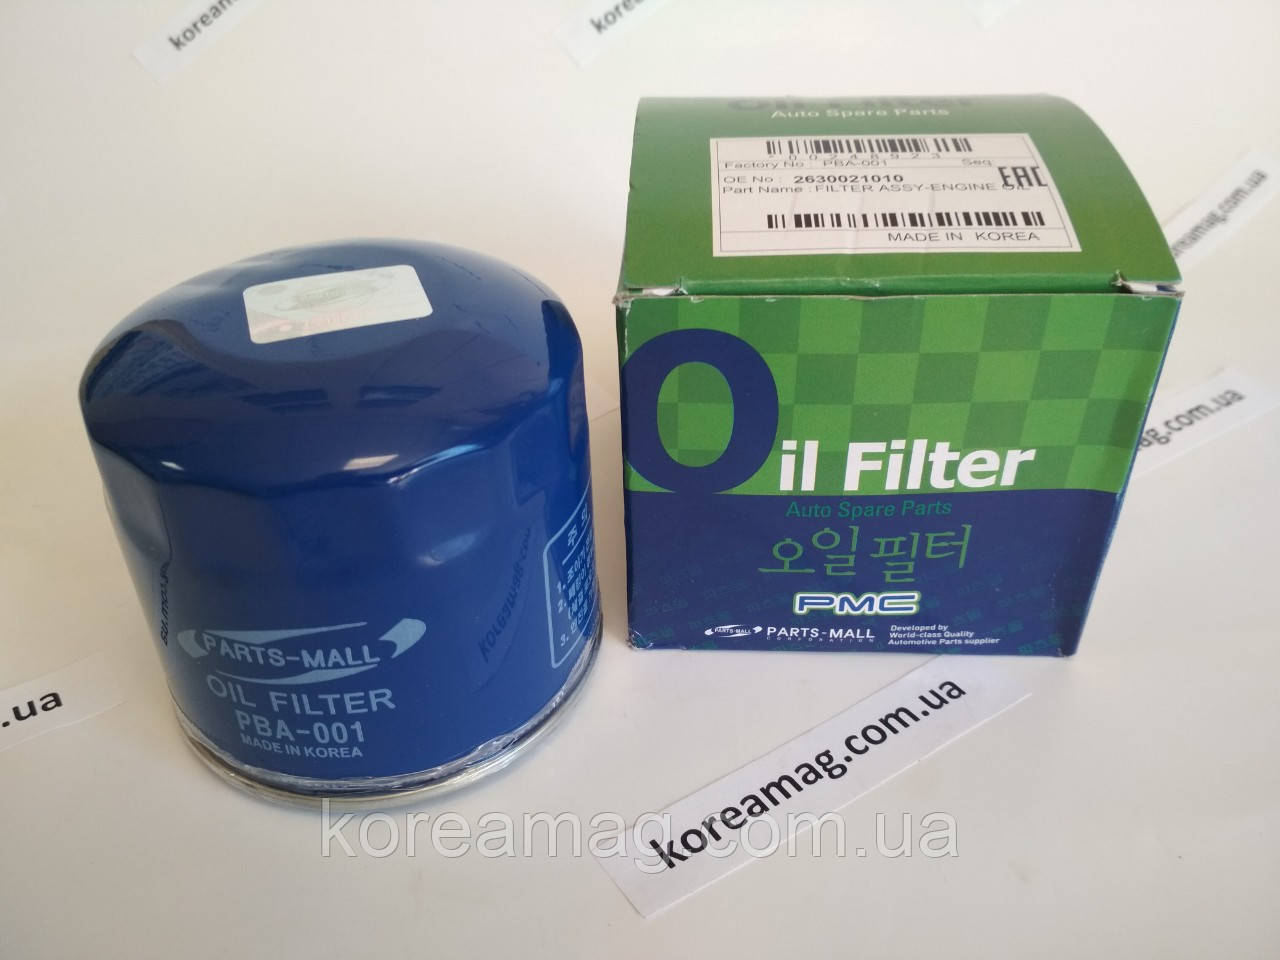 Фильтр масляный для Hyundai Kia